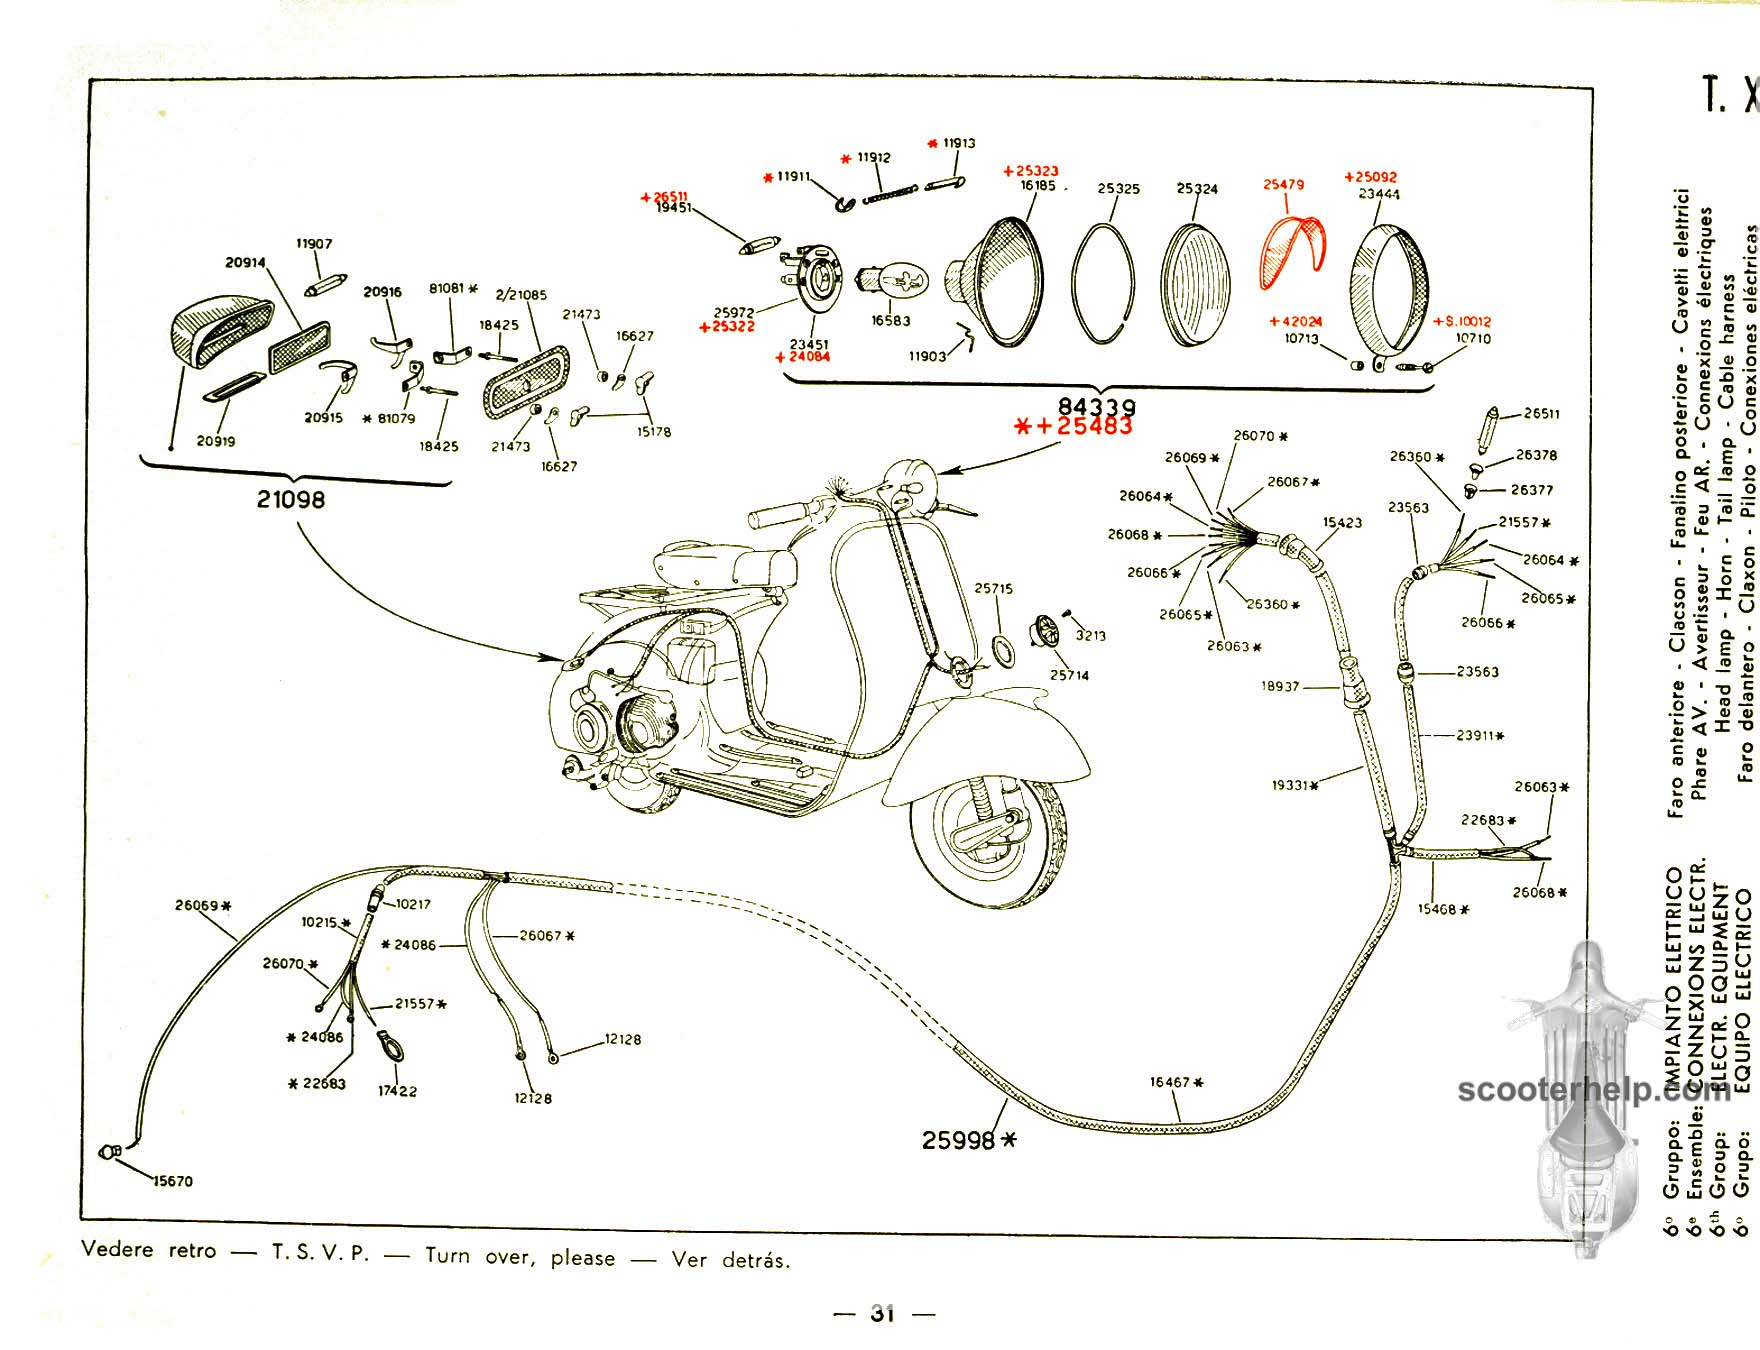 Wiring Diagram Vespa Et4 Jacobs Ladder Wiring Diagram 04 Durango